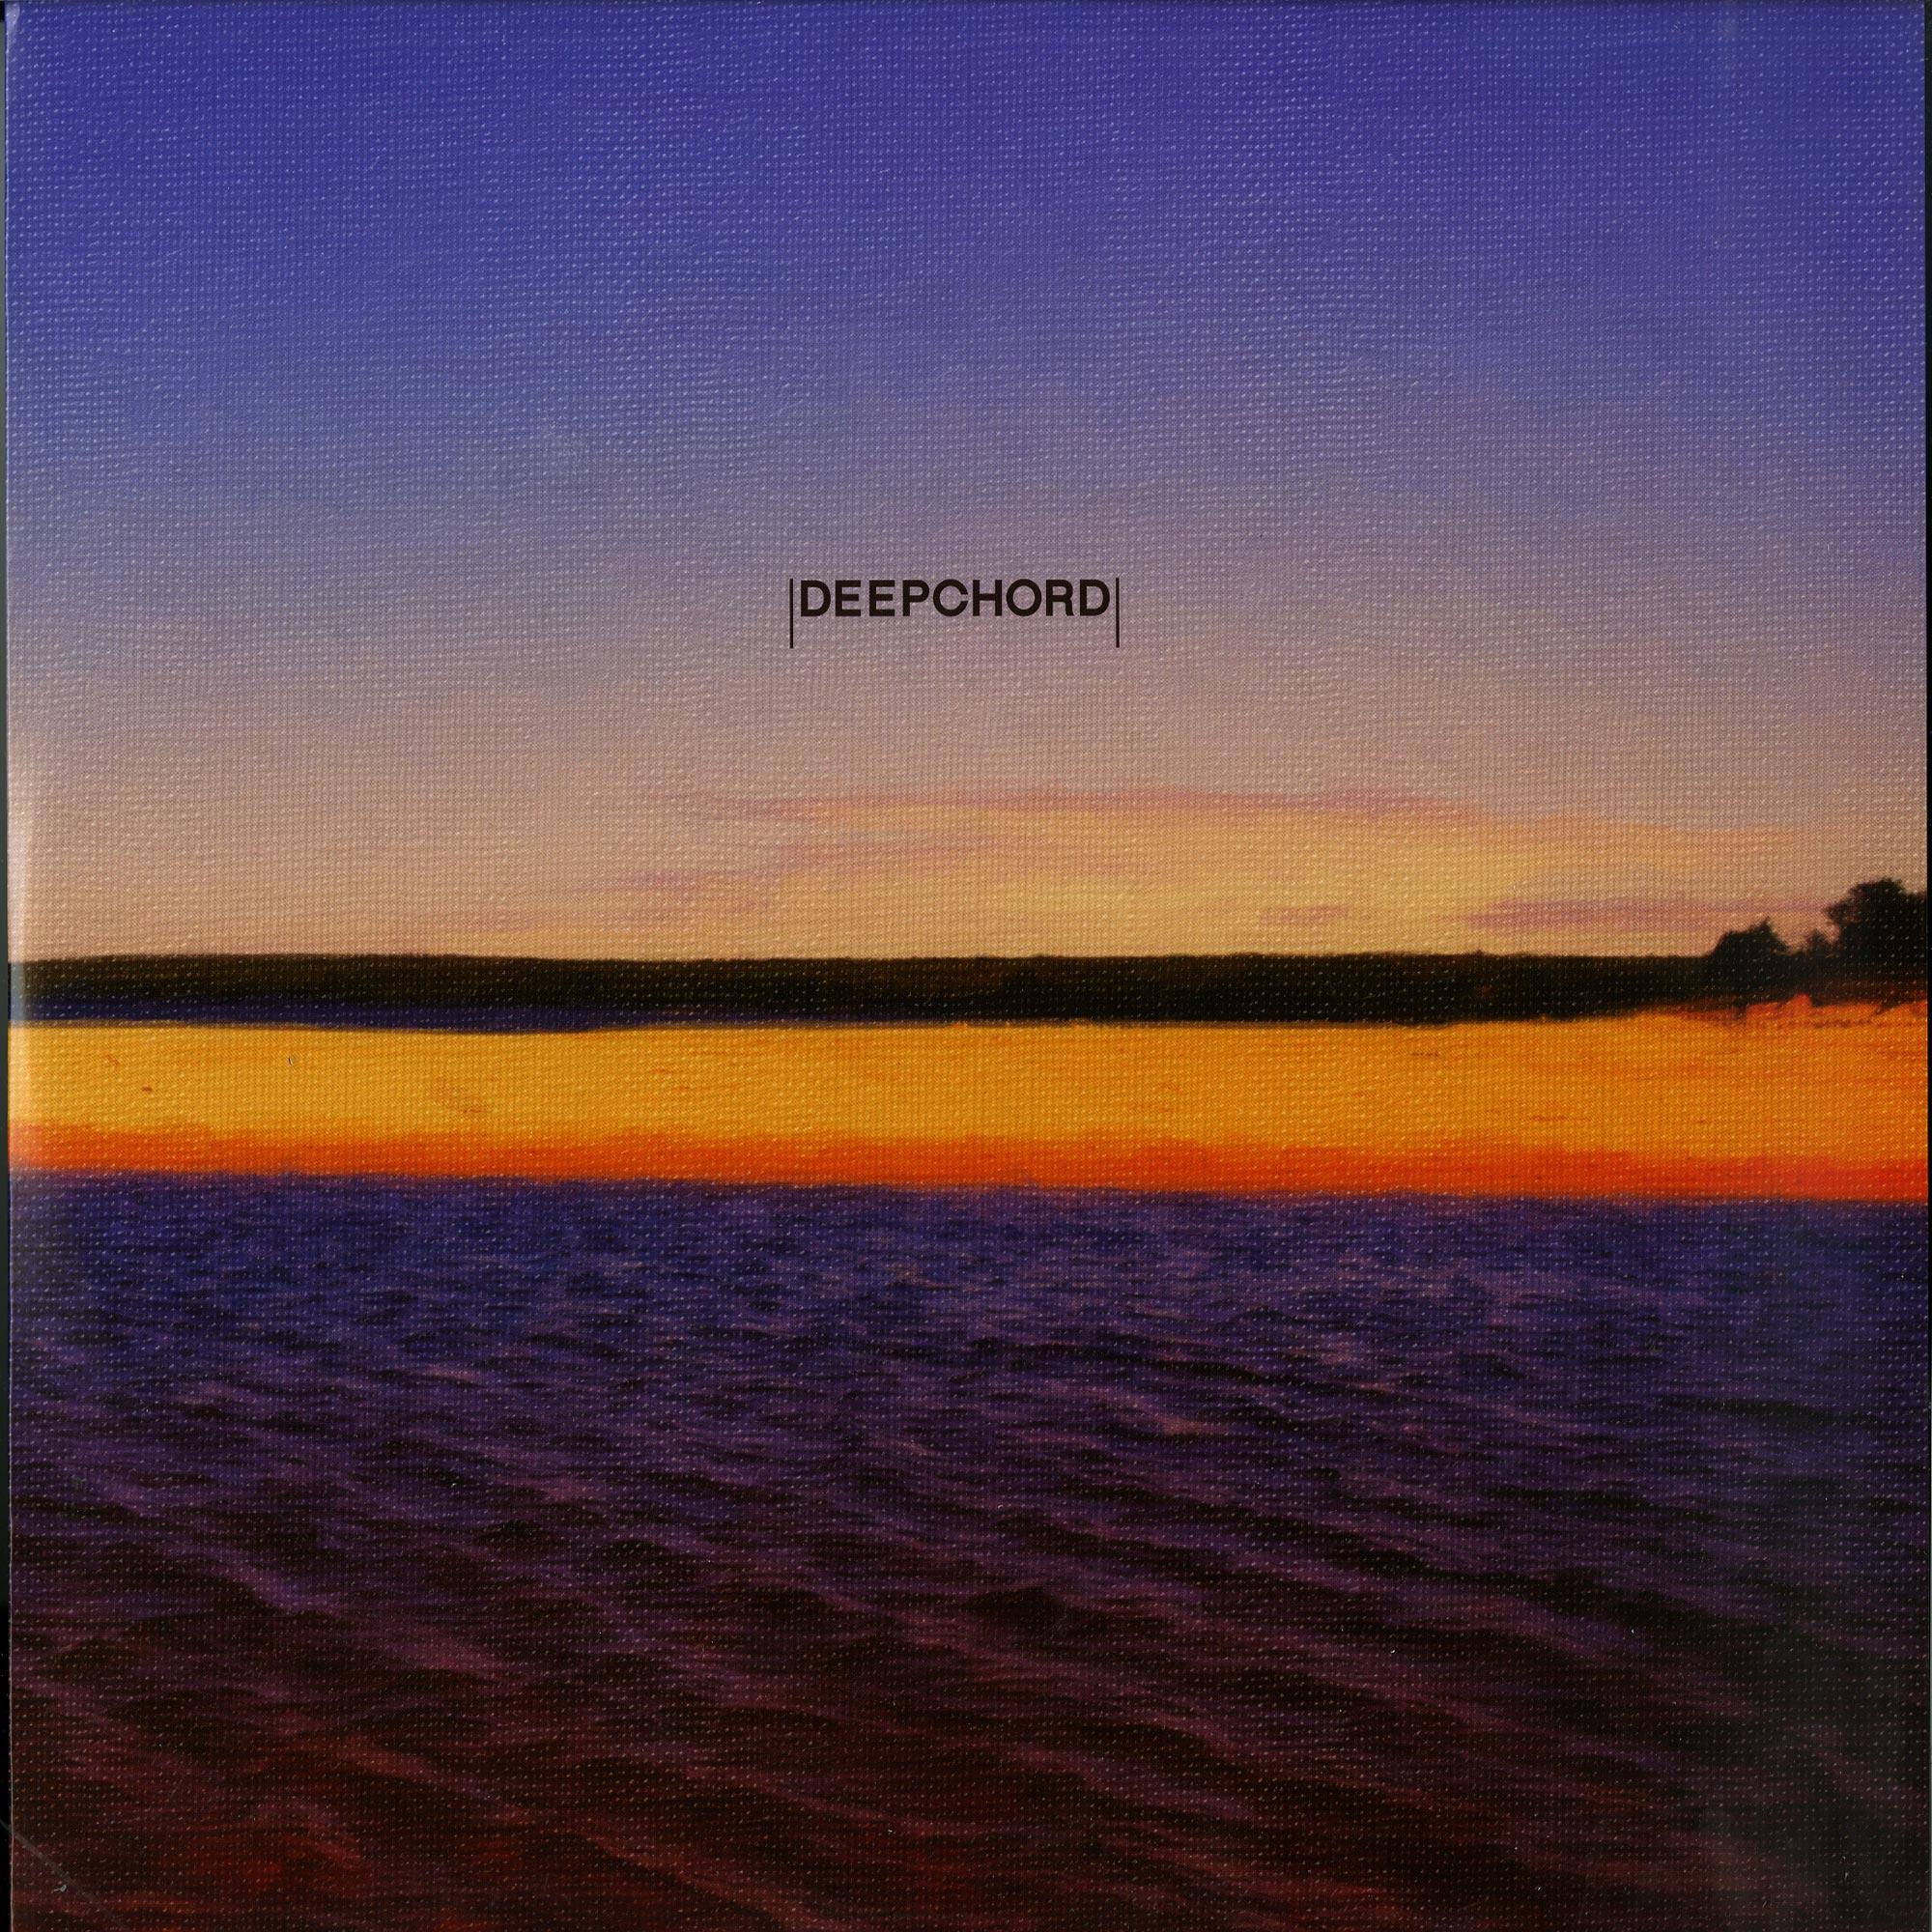 Deepchord - NORTHERN SHORES EP